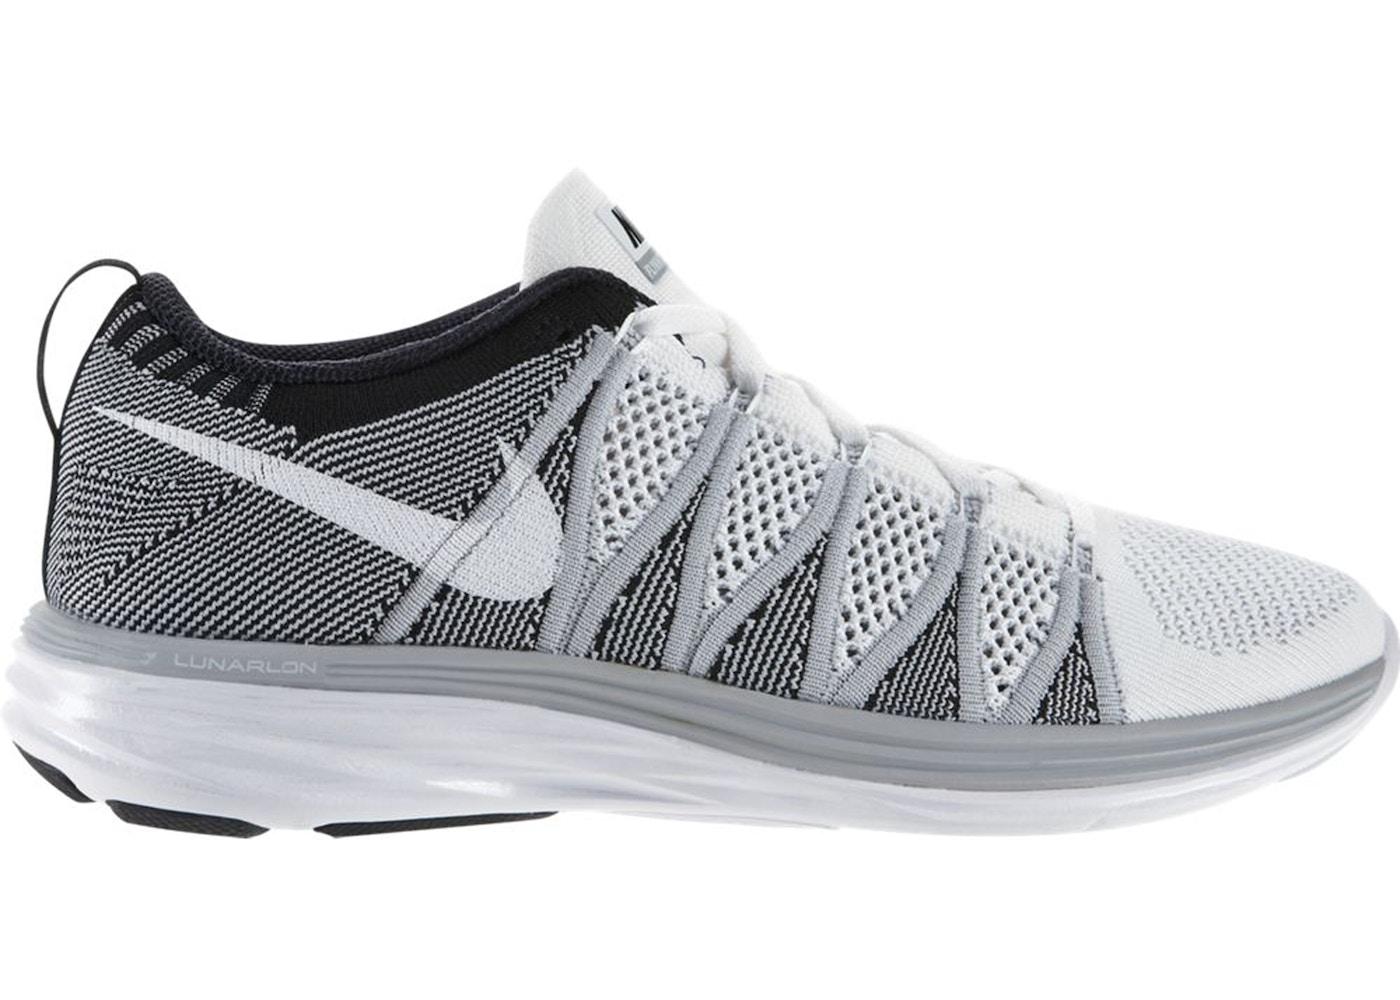 Prohibir parque Natural En cualquier momento  Nike Flyknit Lunar 2 White Wolf Grey Black - 620465-100